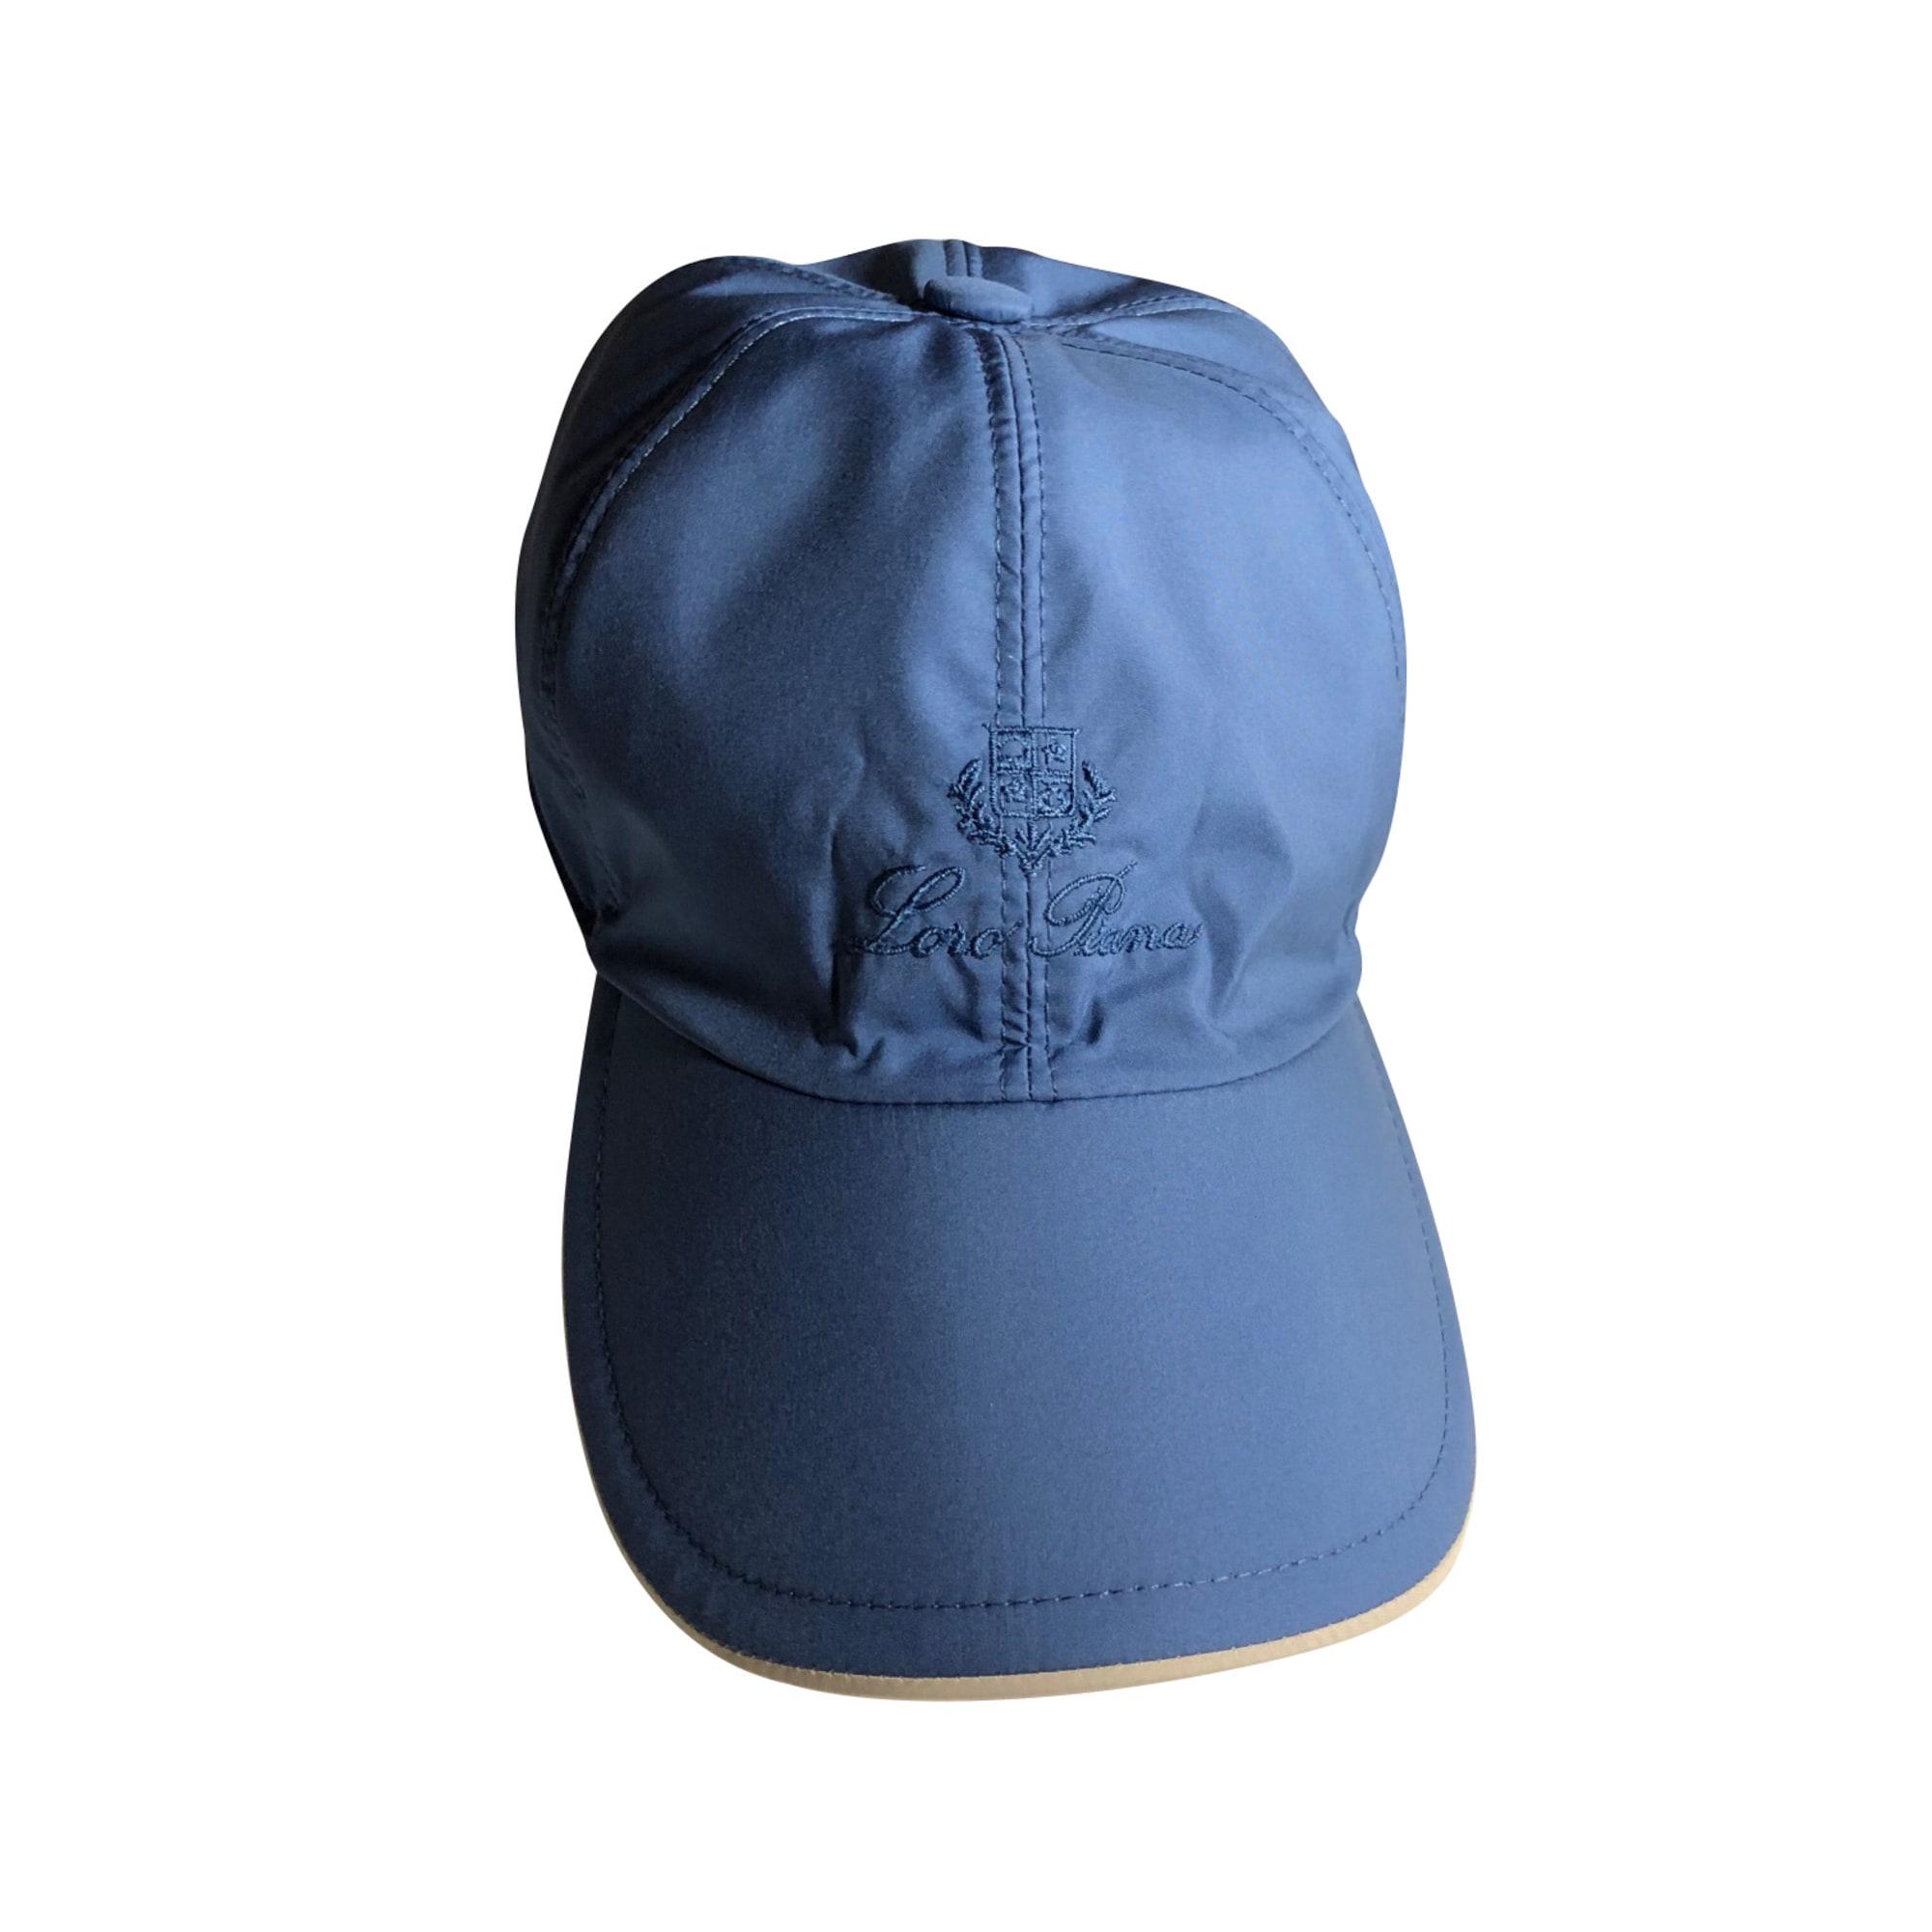 Casquette LORO PIANA Bleu, bleu marine, bleu turquoise